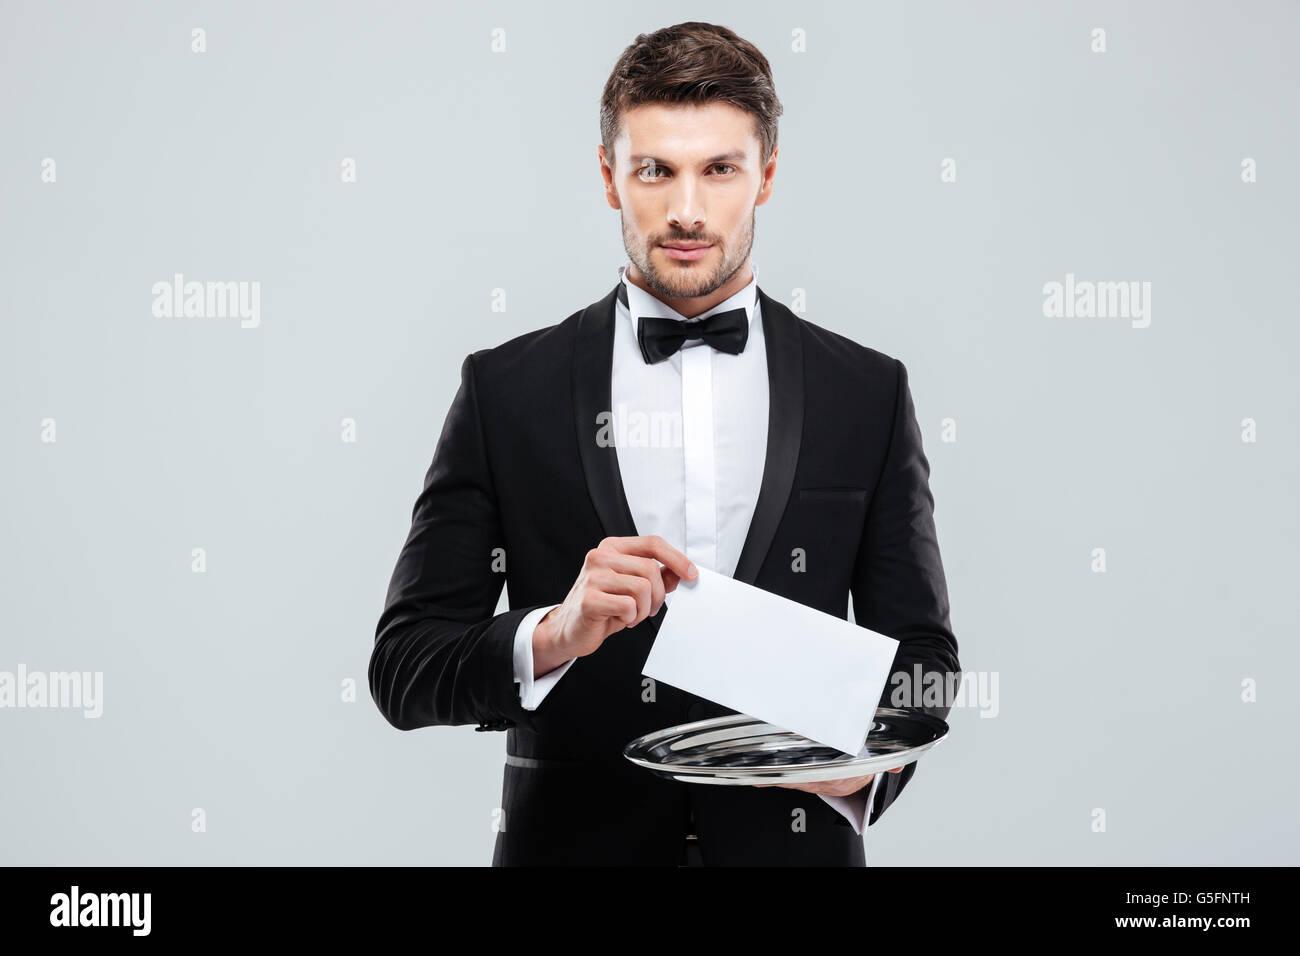 Beau jeune garçon in tuxedo holding tray with carte vierge Banque D'Images